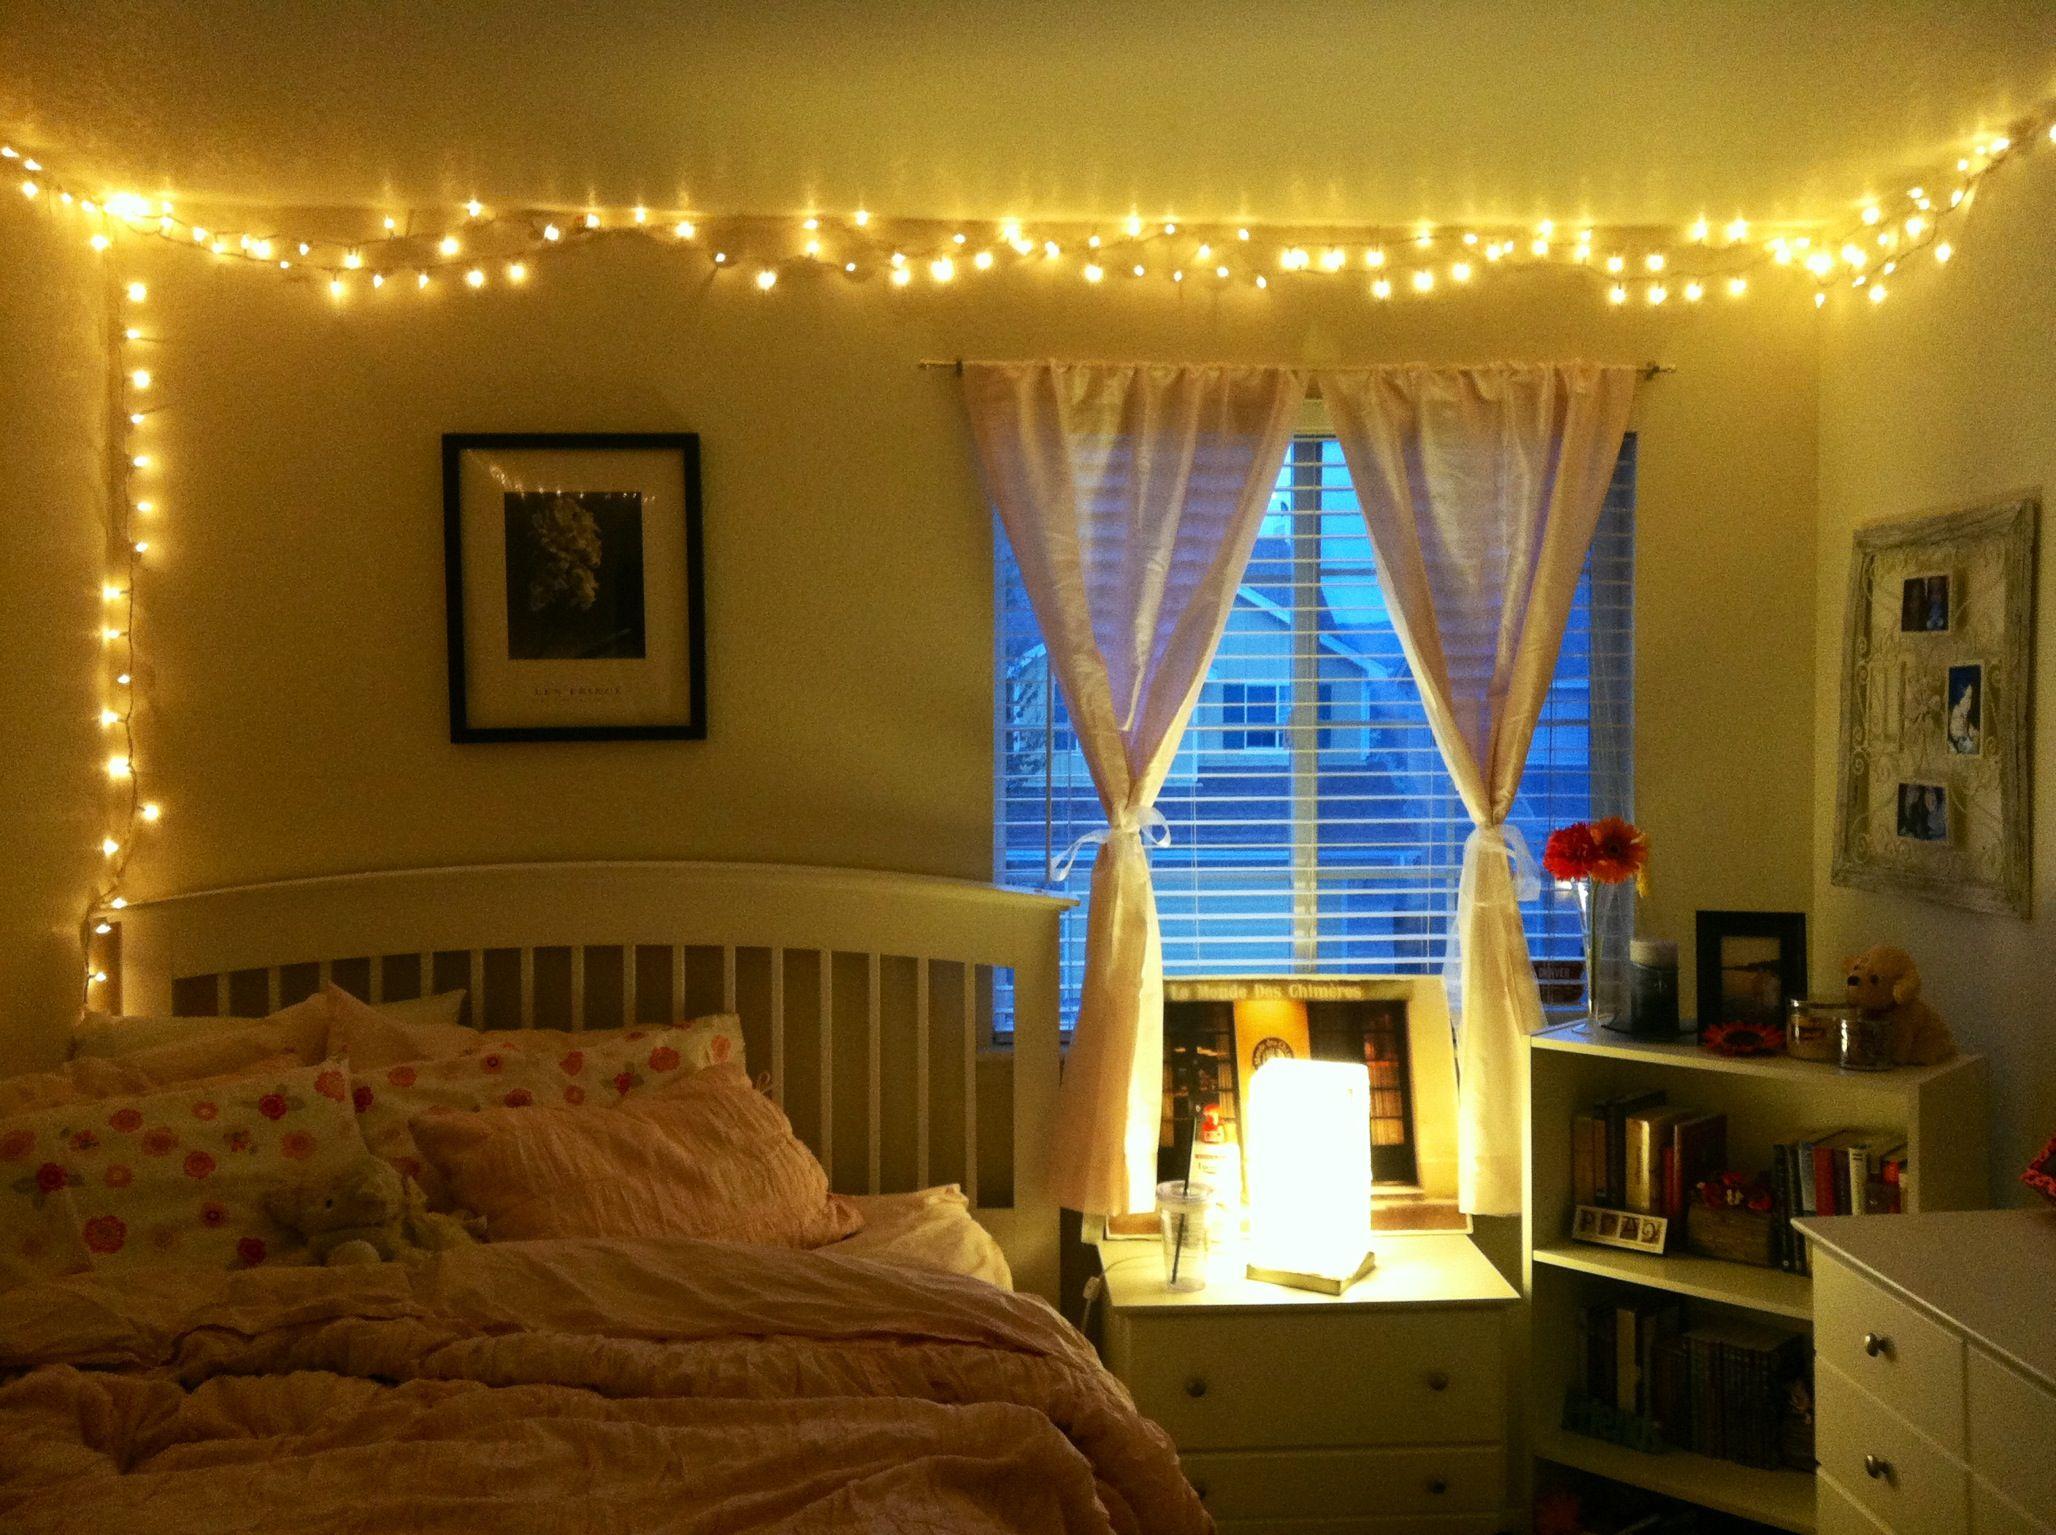 17 Best images about Bedroom on Pinterest   String lights  Light bedroom  and Tumblr room. 17 Best images about Bedroom on Pinterest   String lights  Light